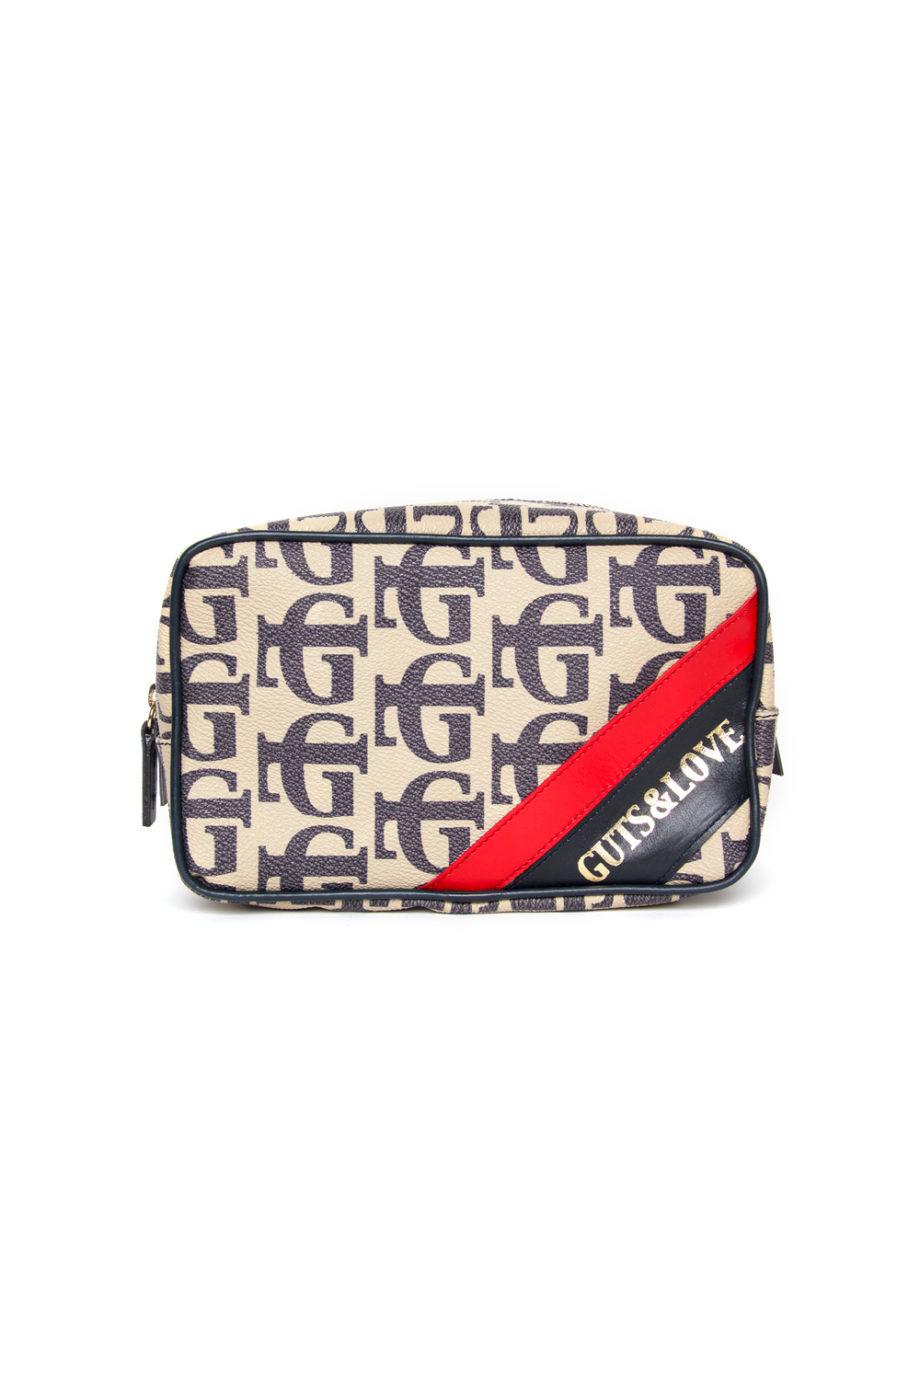 Custom you need me bag